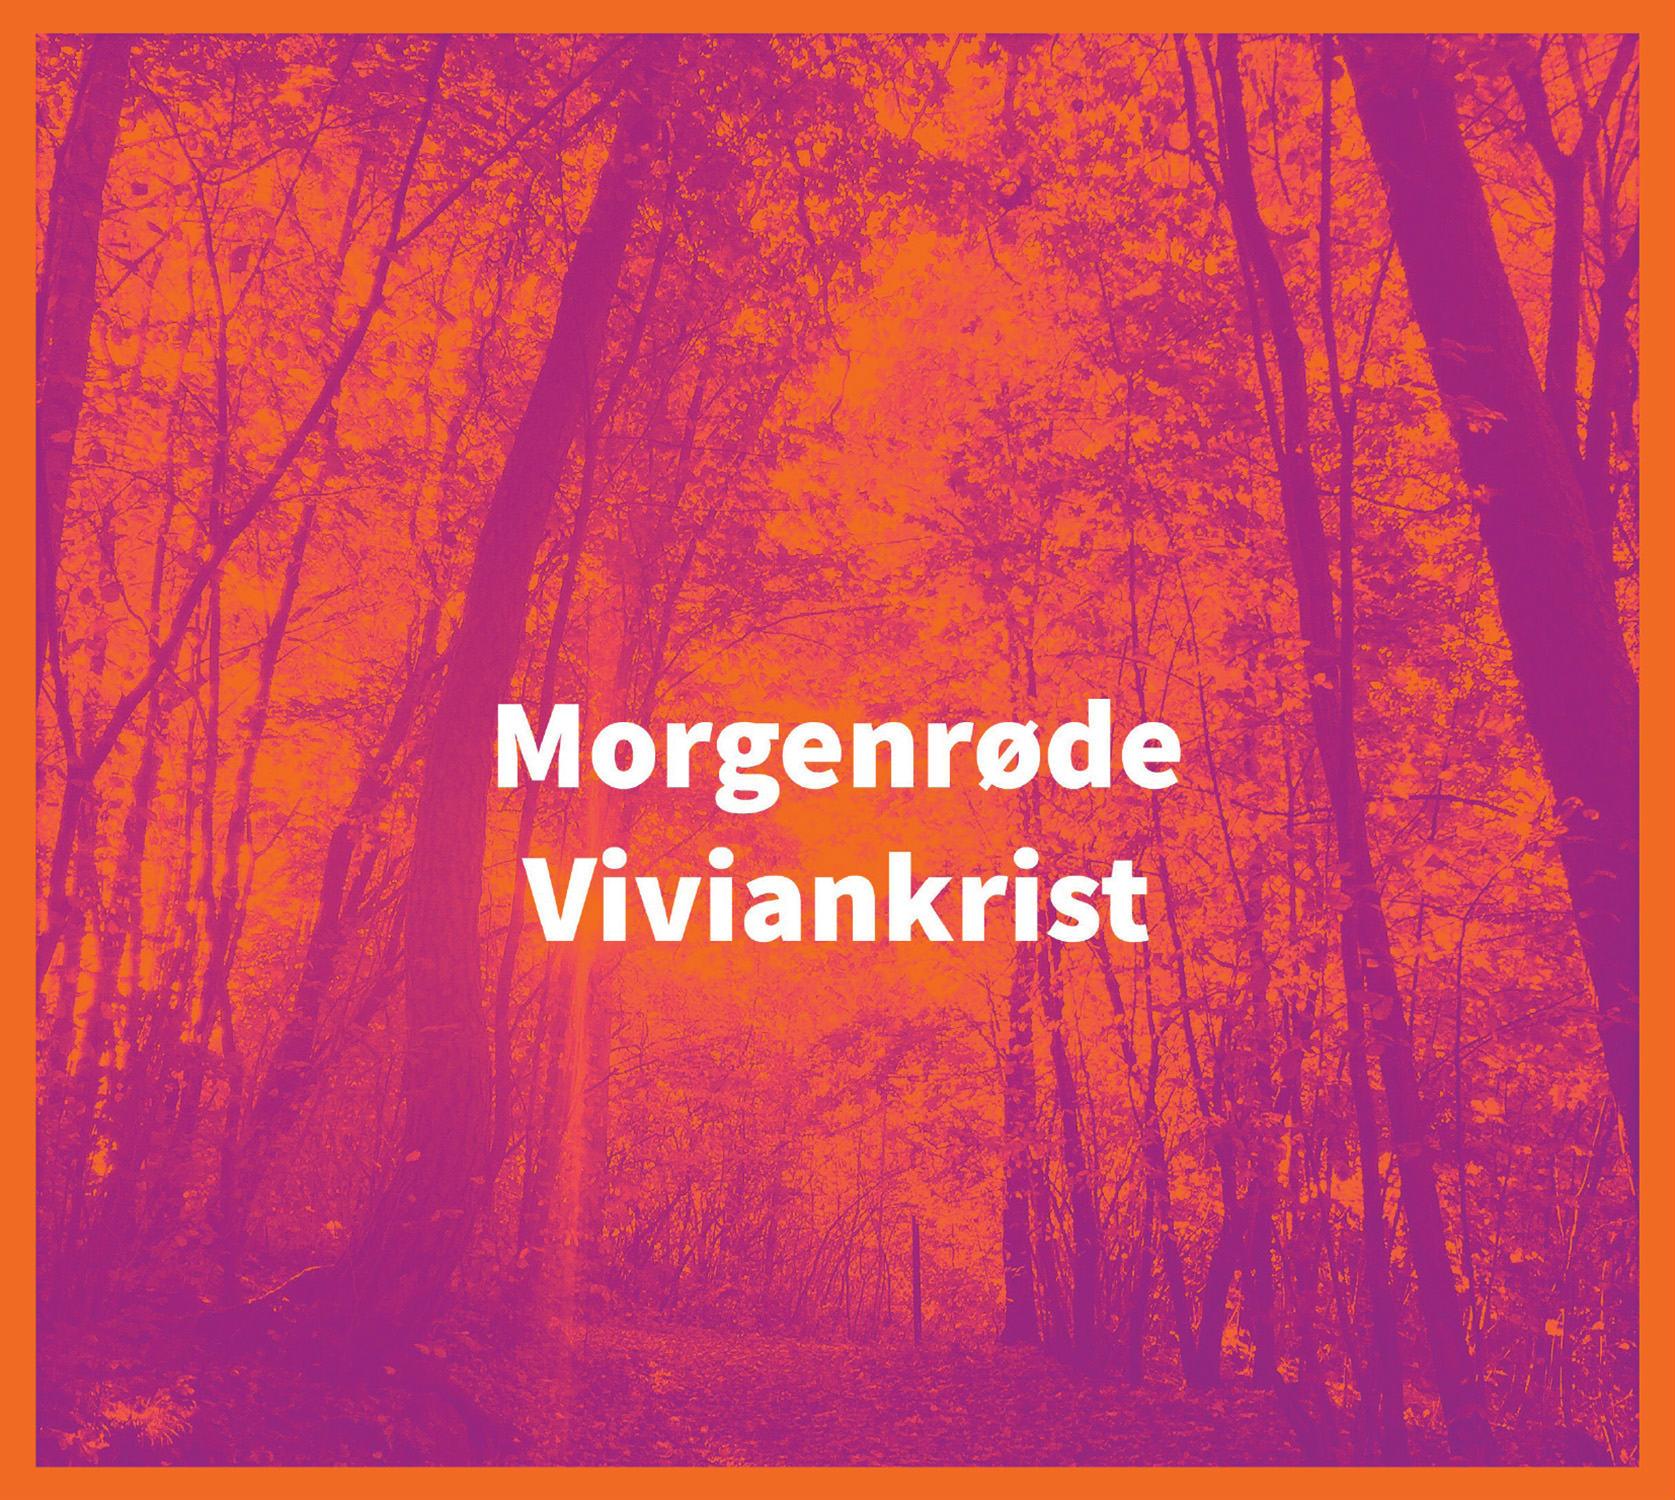 VIVIANKRIST Morgenrode - Lo res album cover for web